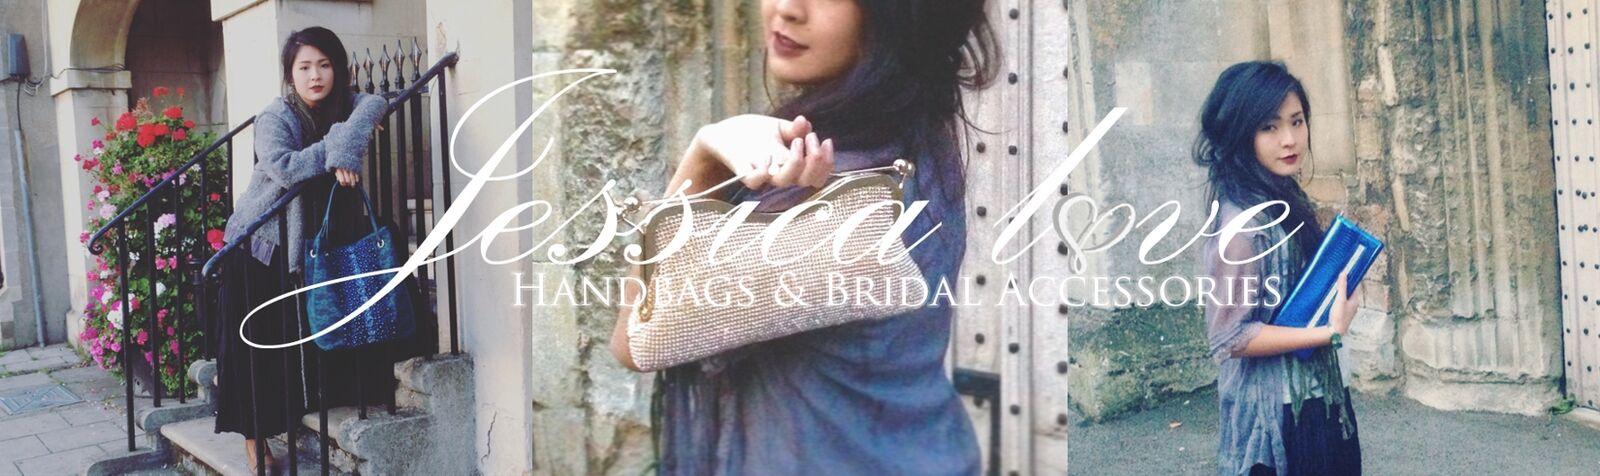 Jessica Love Handbags